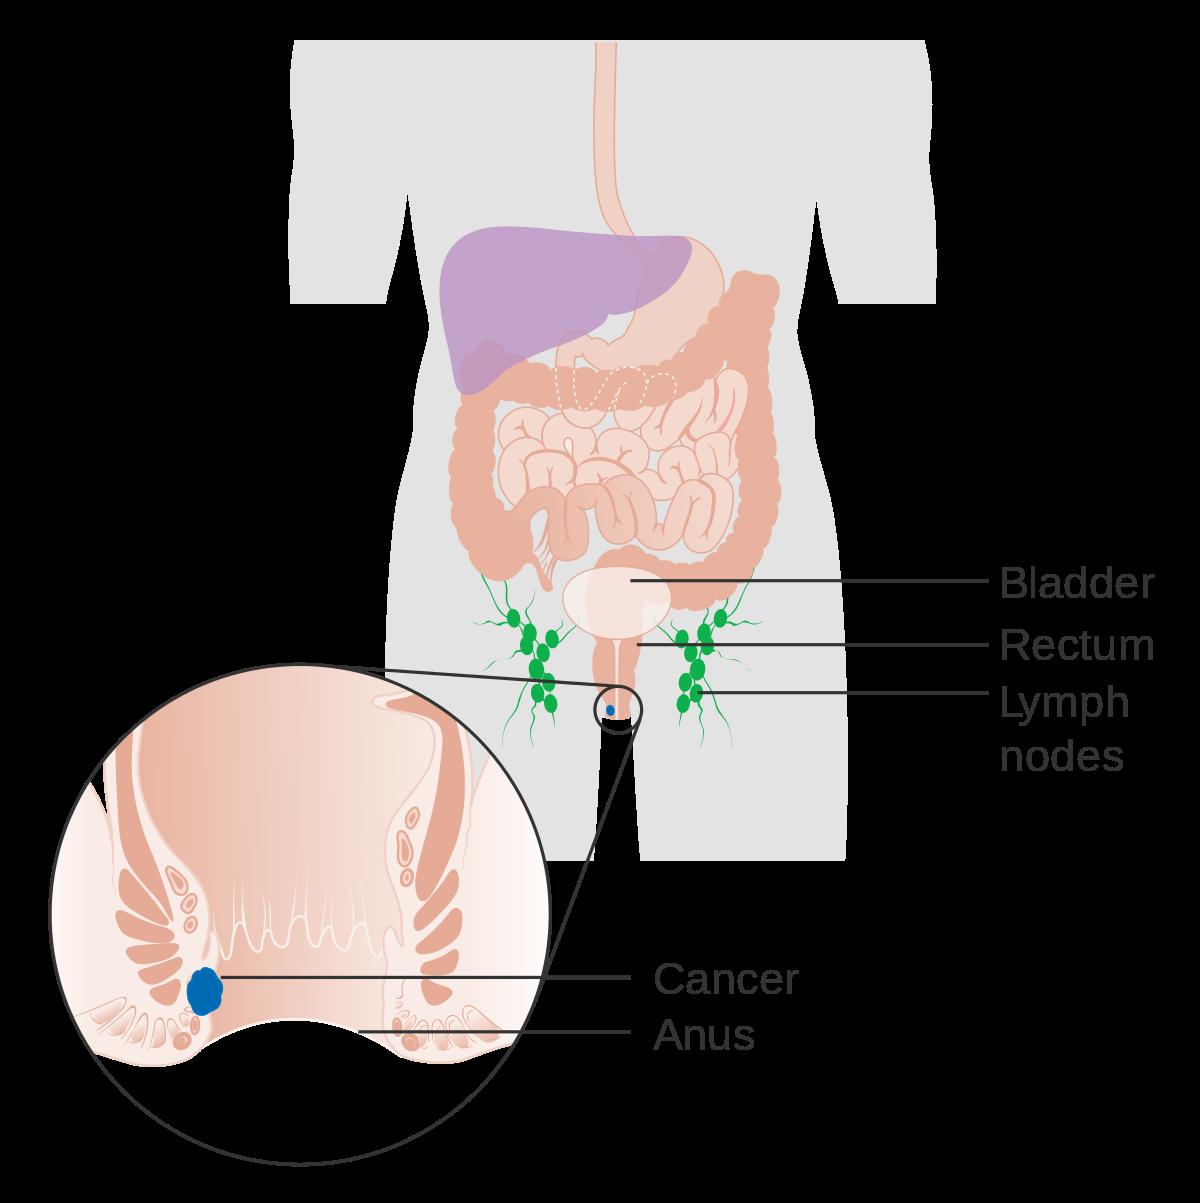 anorectal papilloma